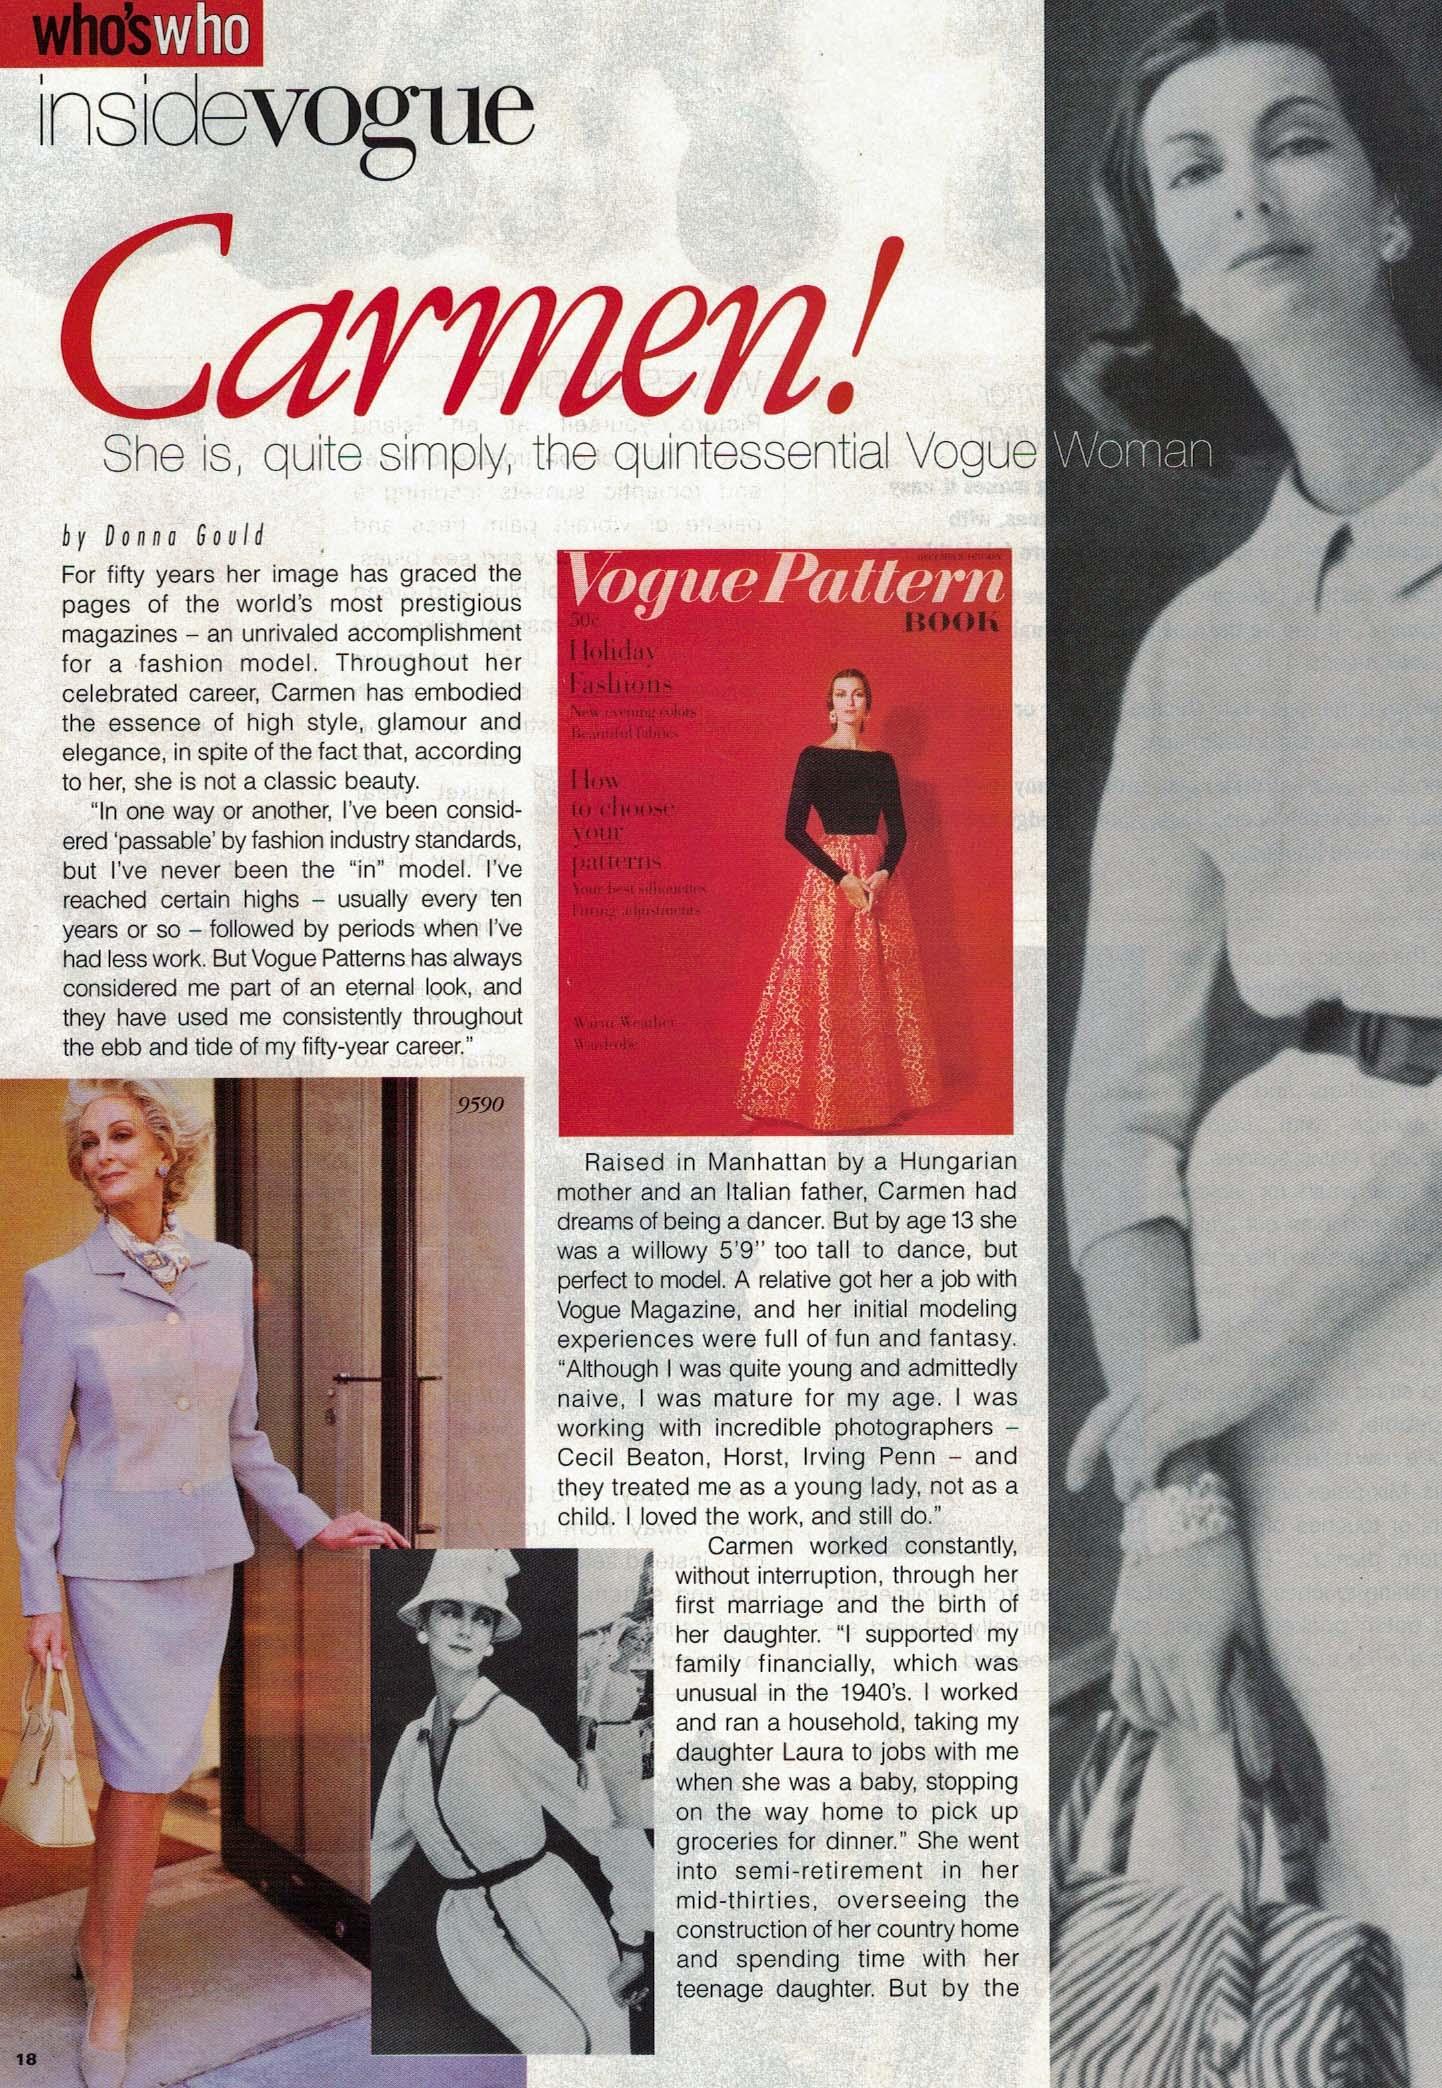 Vogue Patterns, January/February 1997